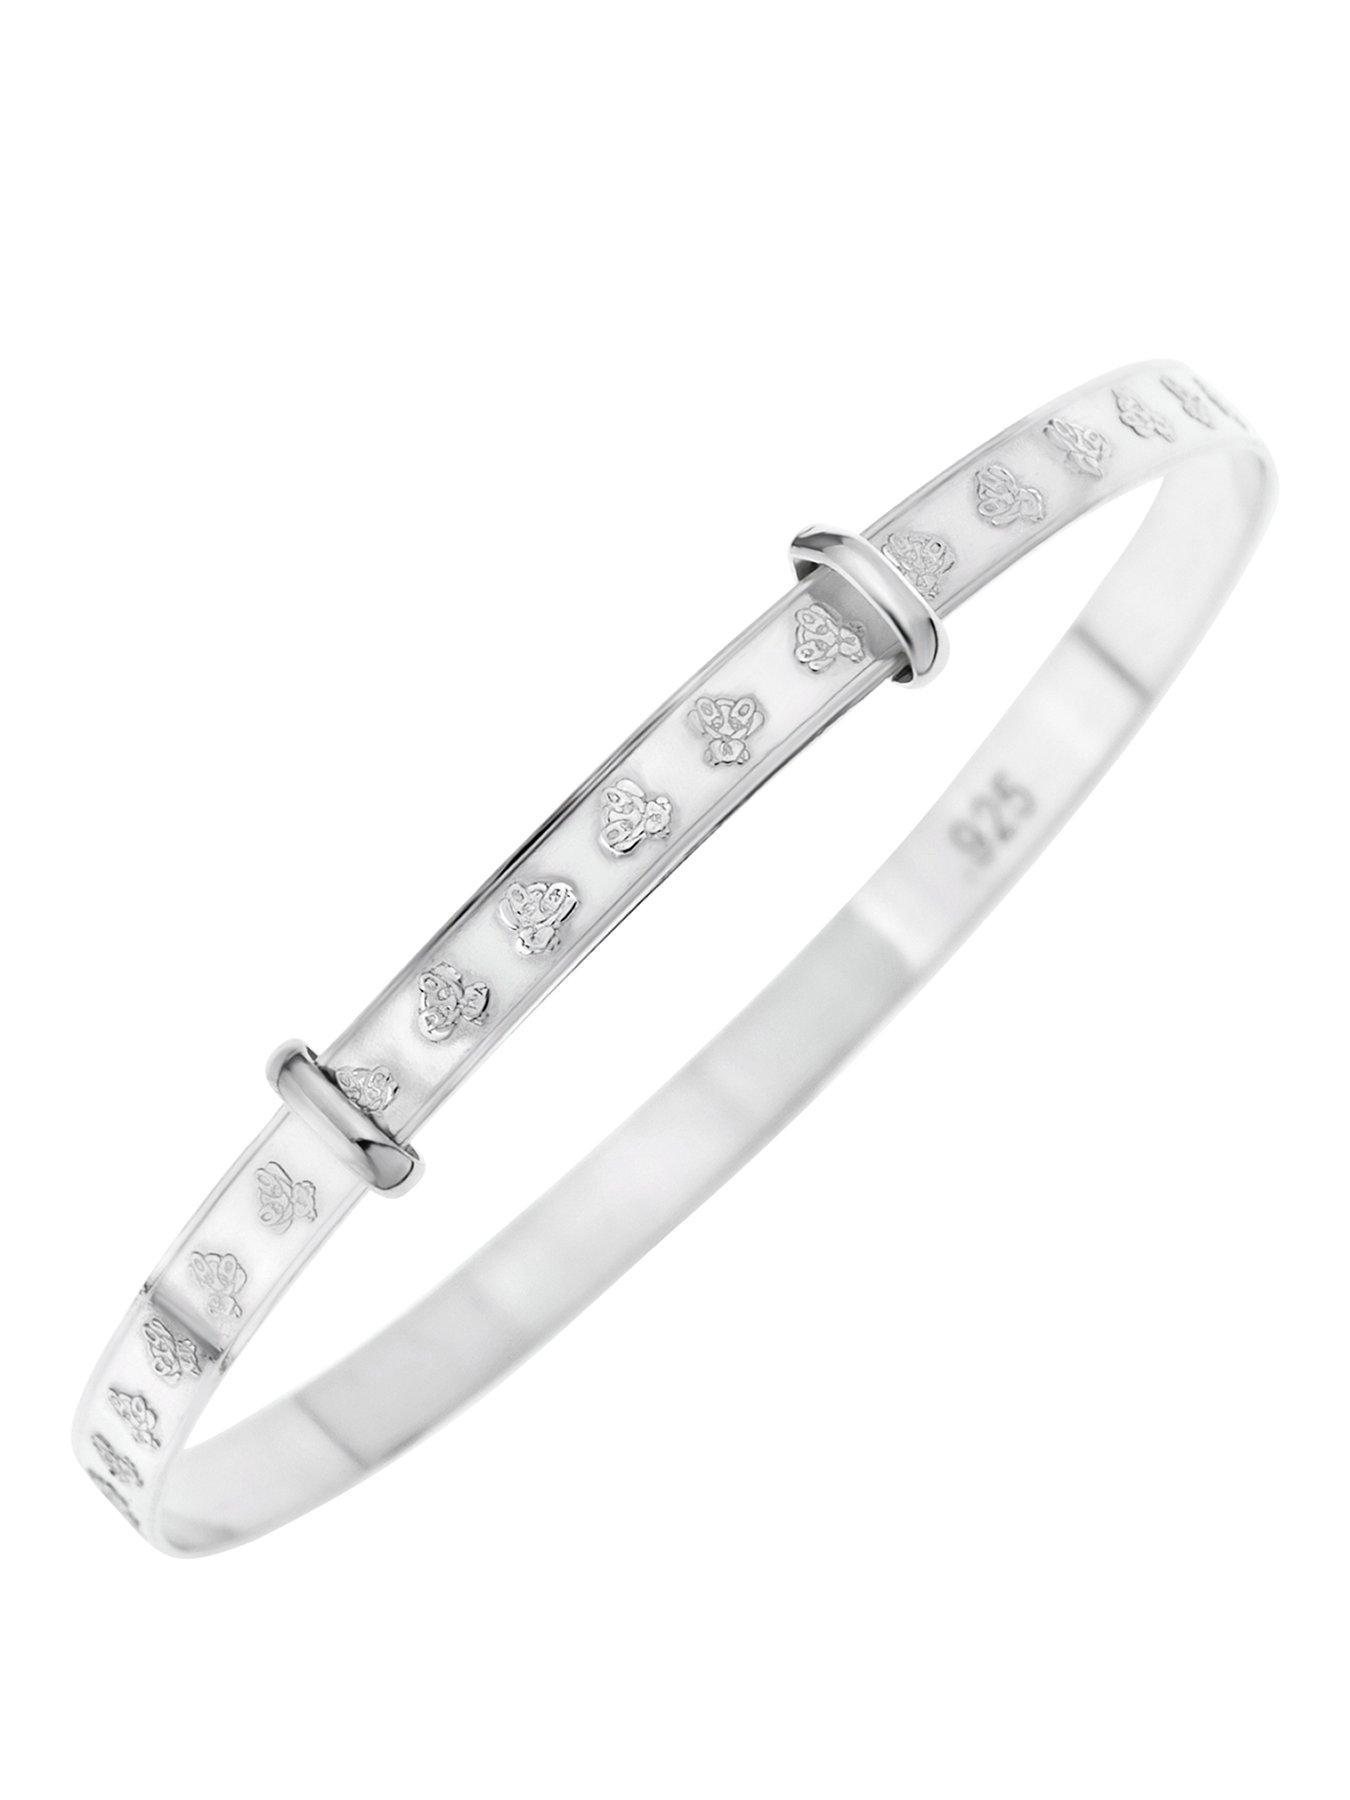 925 Sterling Silver Plated 5 Hearts Bracelet Bangle Gift Jewellery Women UK Gift